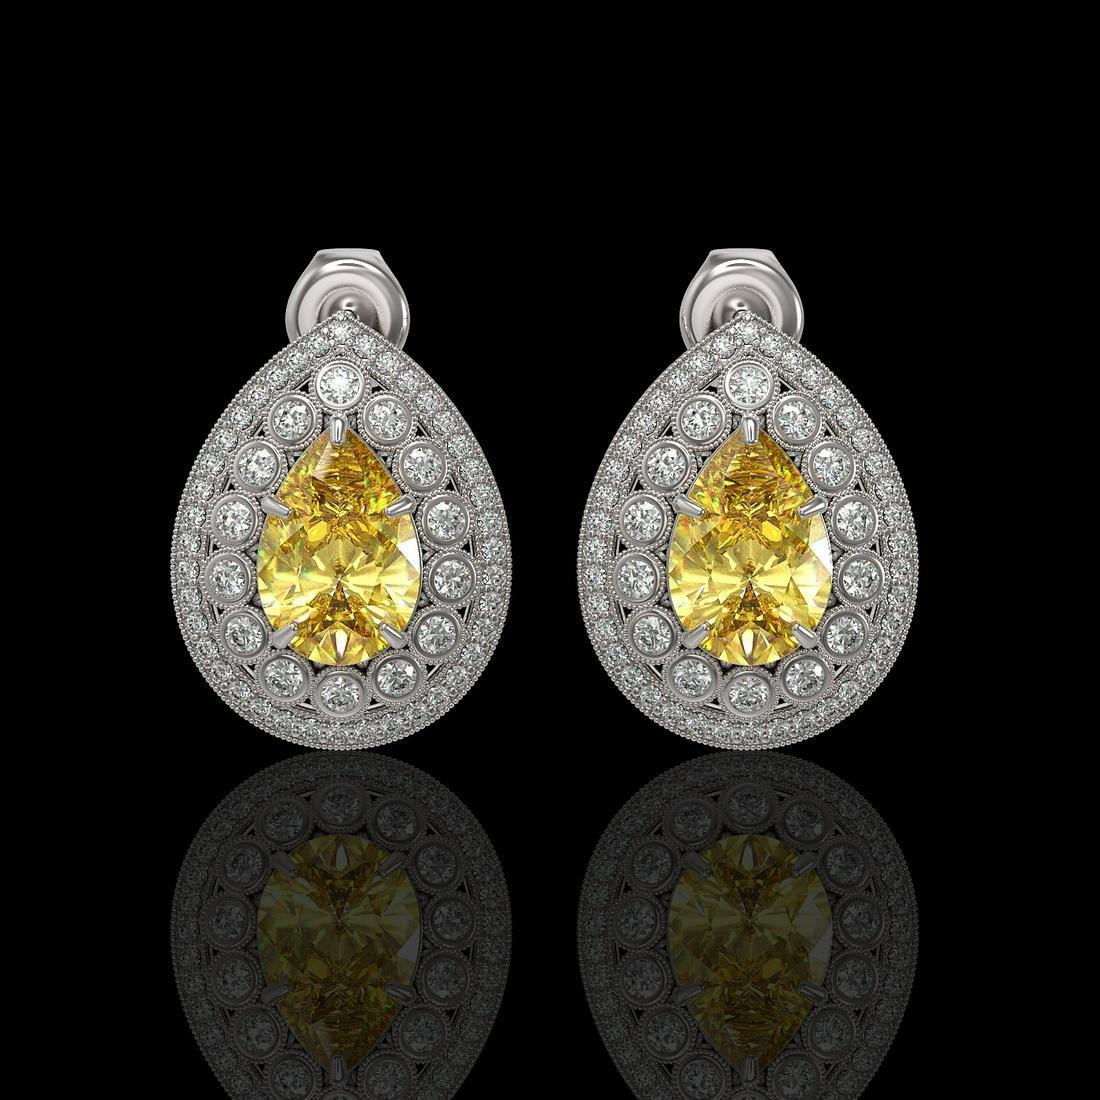 7.74 ctw Canary Citrine & Diamond Earrings 14K White